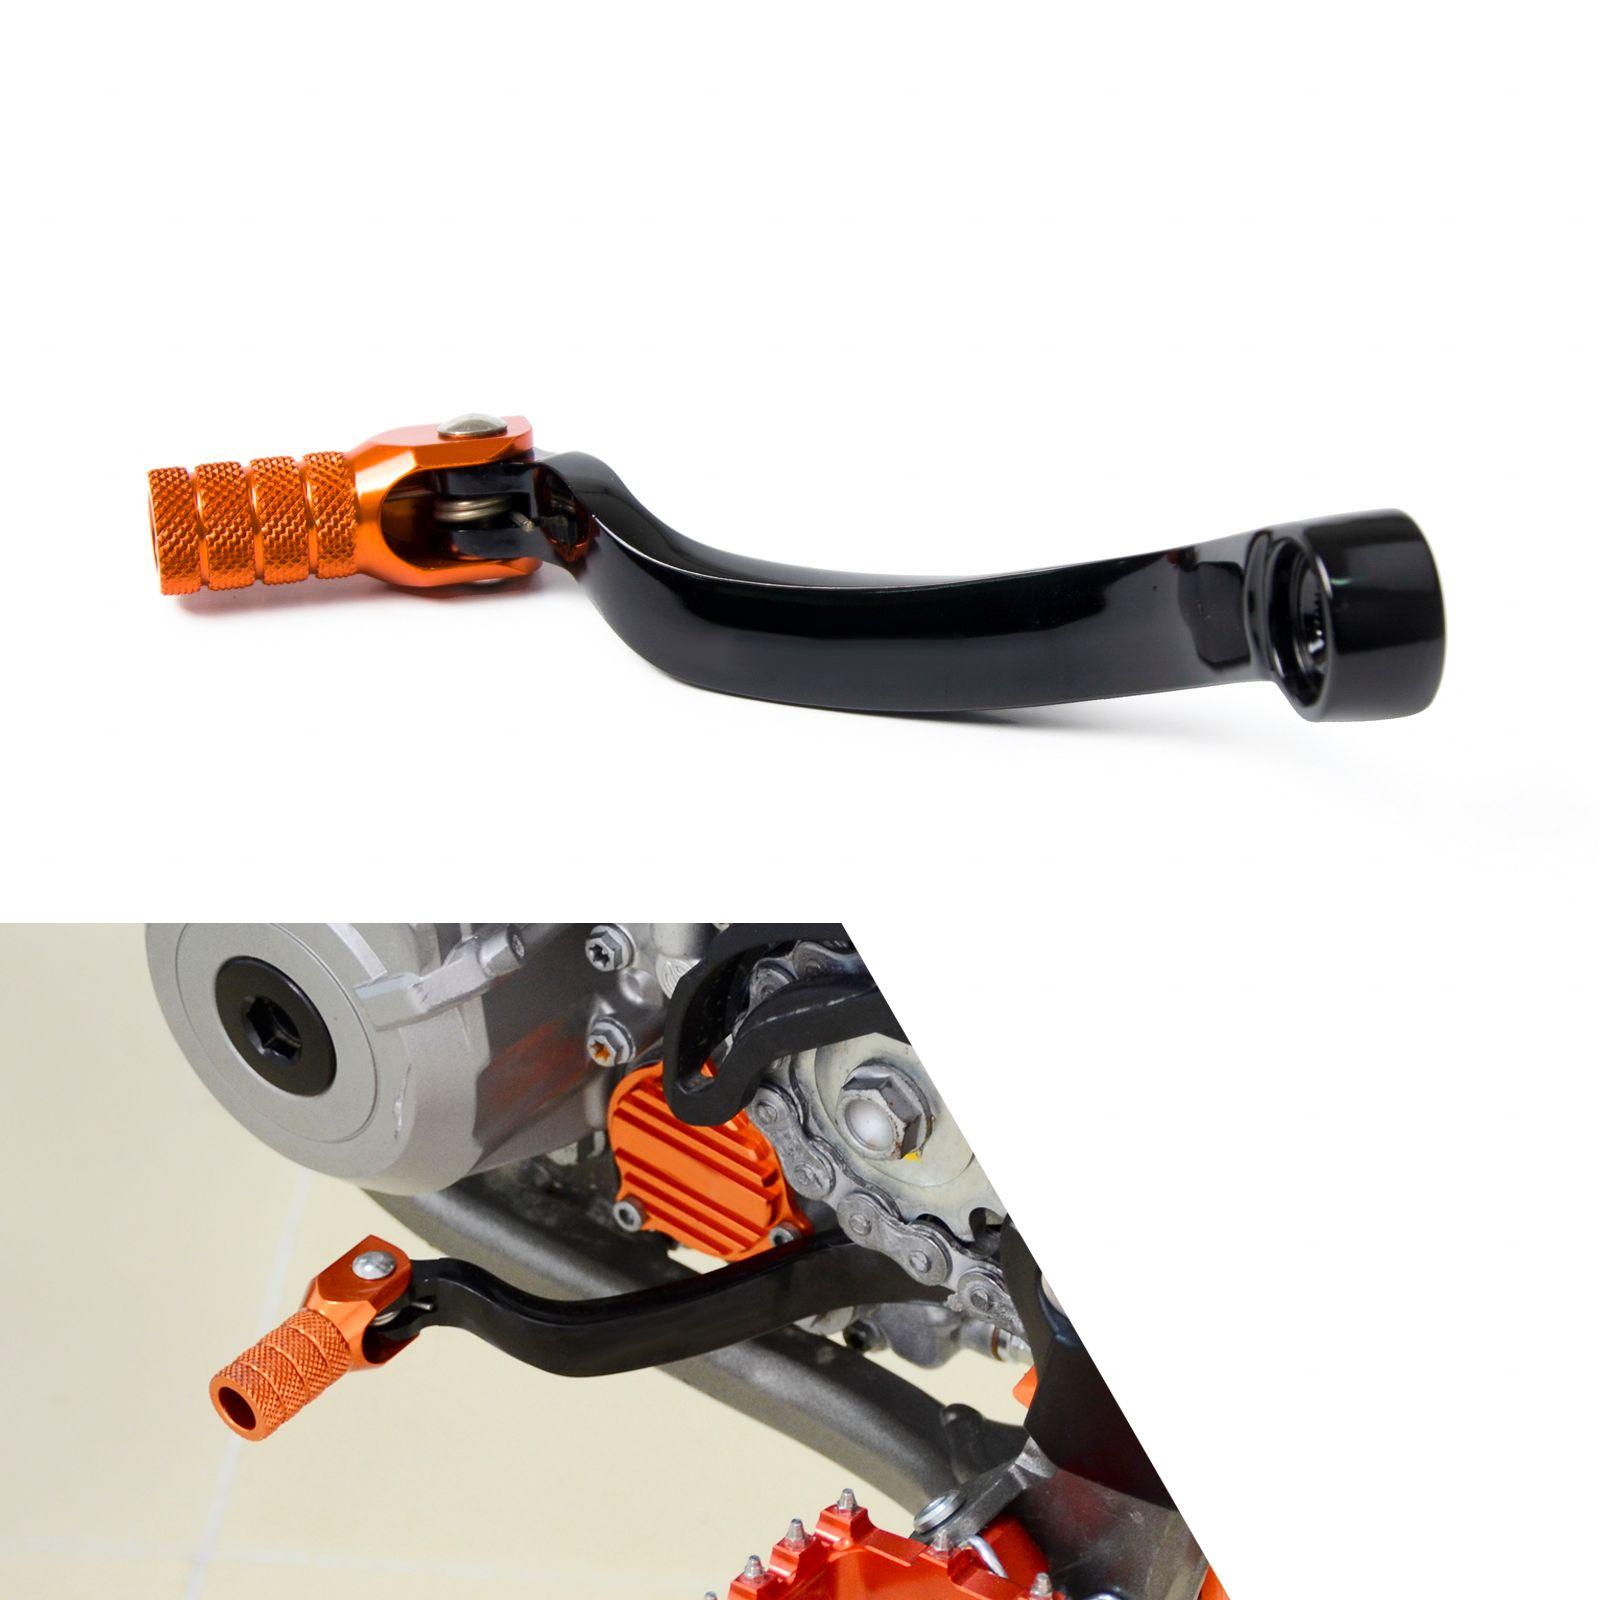 NICECNC CNC Folding Forged Gear Shifter Shift Lever Pedal For KTM 125 150 200 250 300 350 450 505 SX XC SX-F XC-F XC-W EXC XCF-W